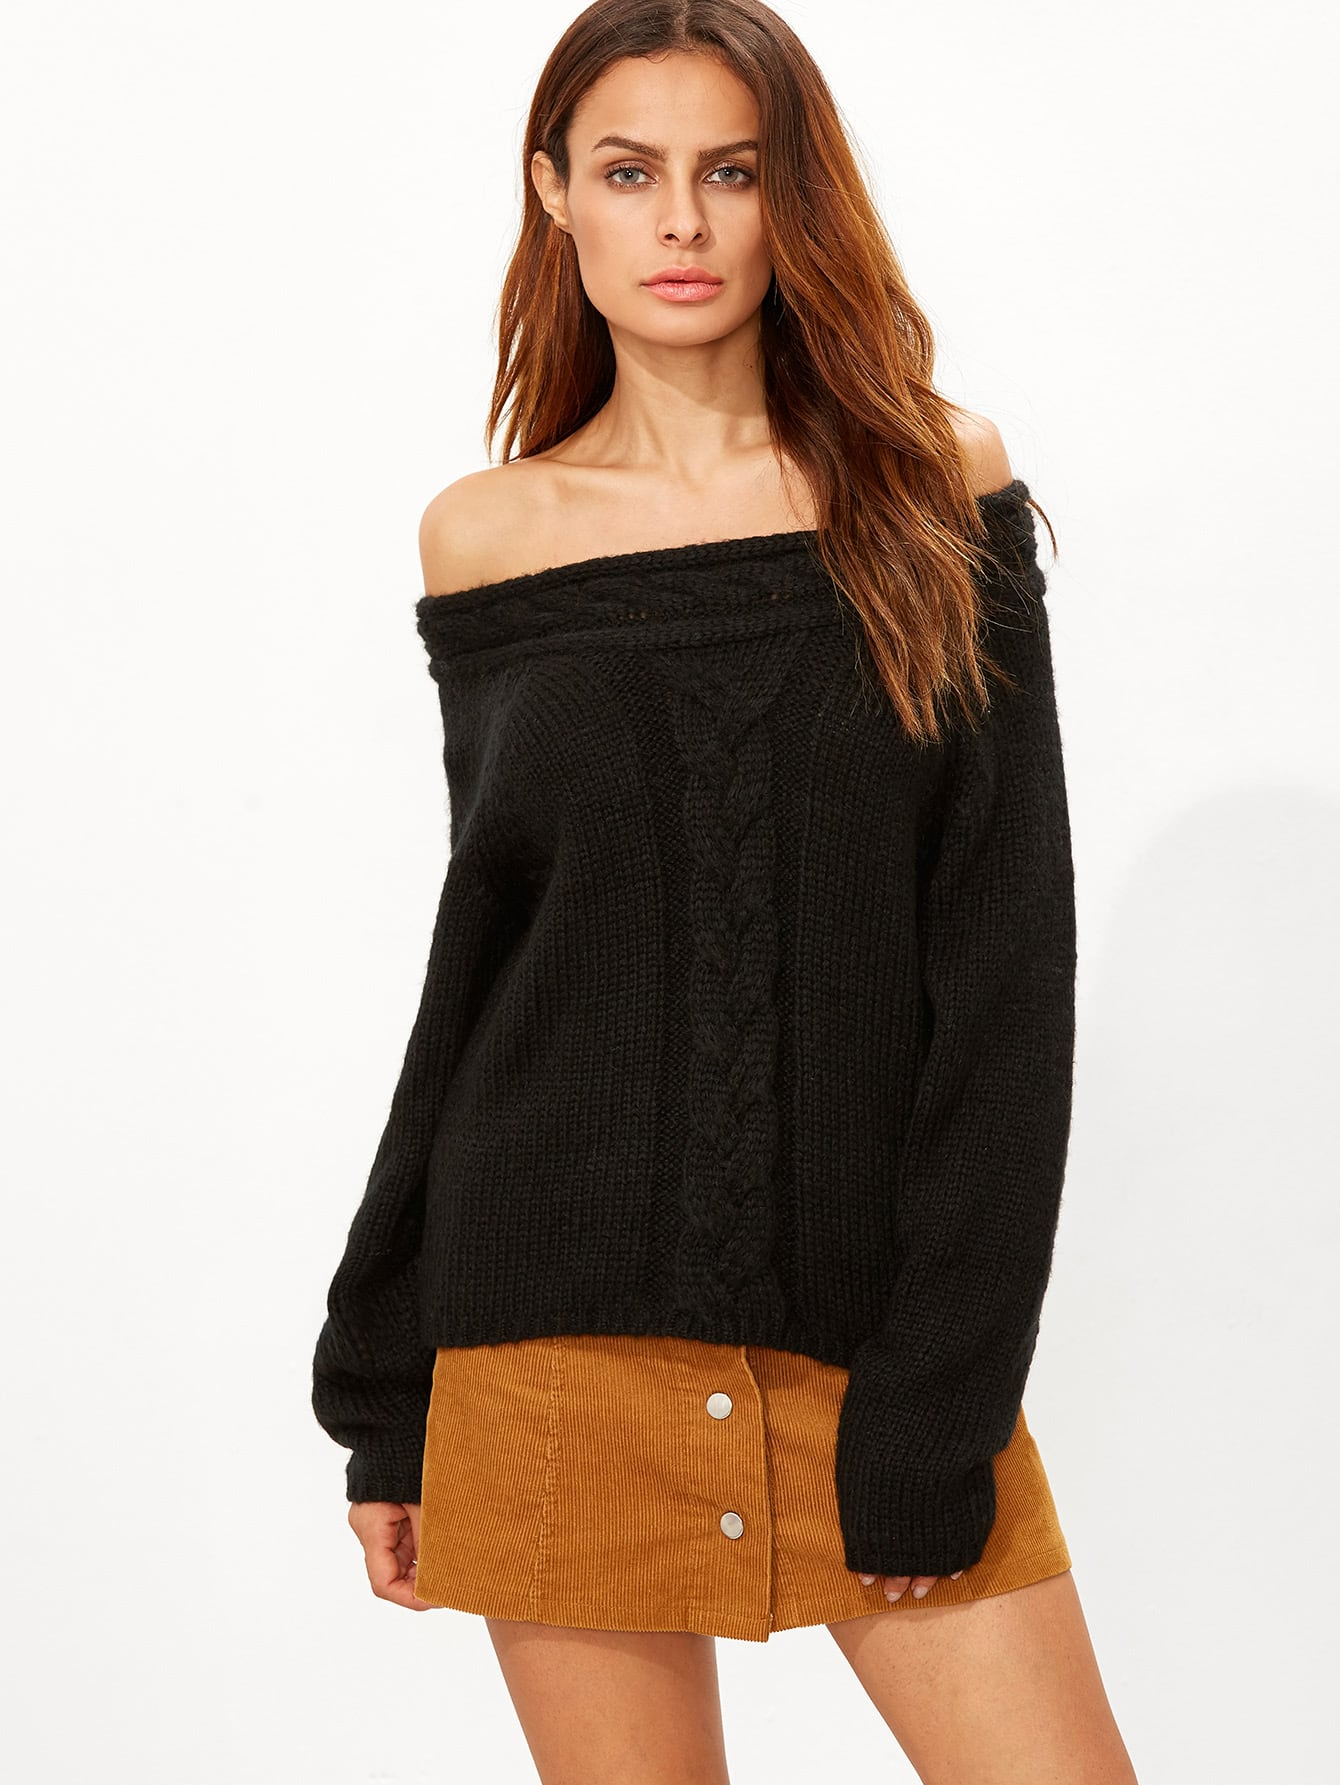 sweater160909461_2